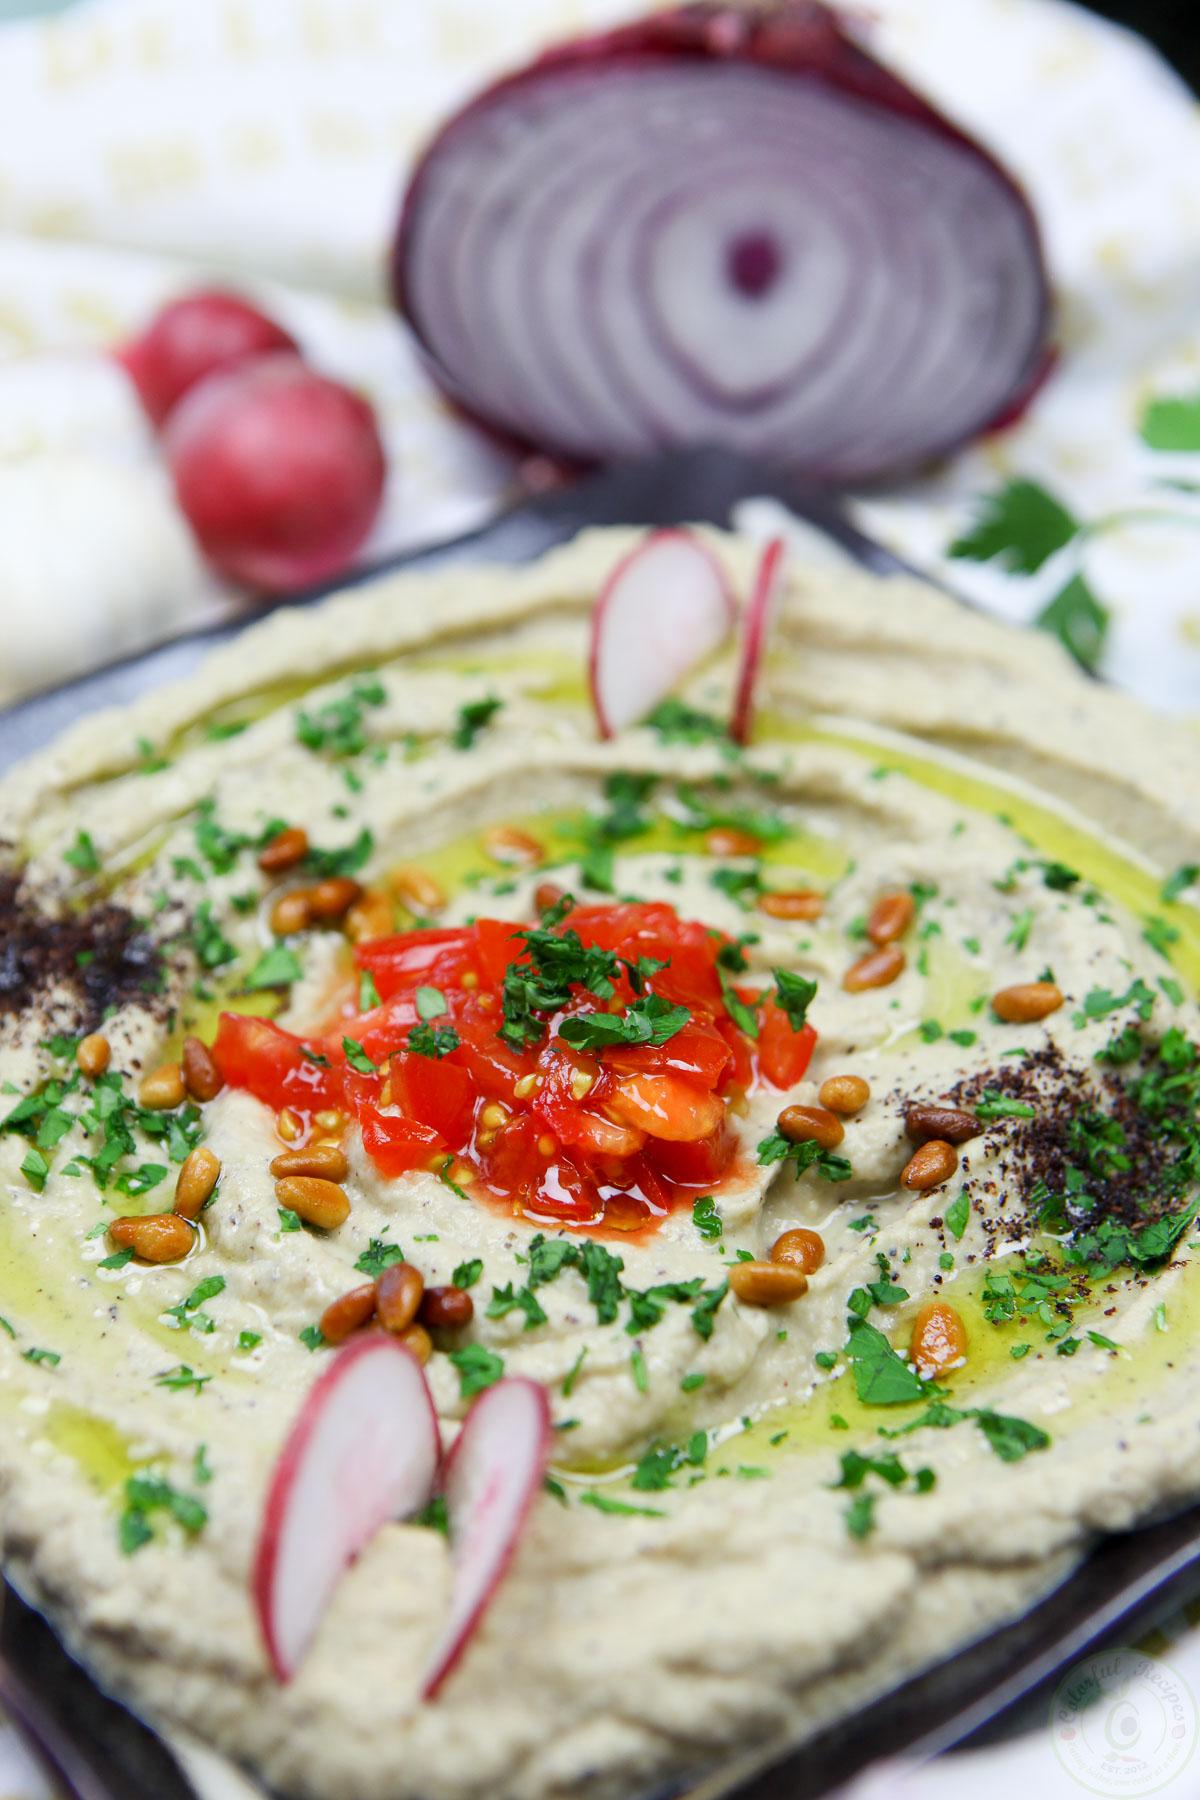 Lebanese Baba Ghanouj Eggplant Dip - Colorful Recipes